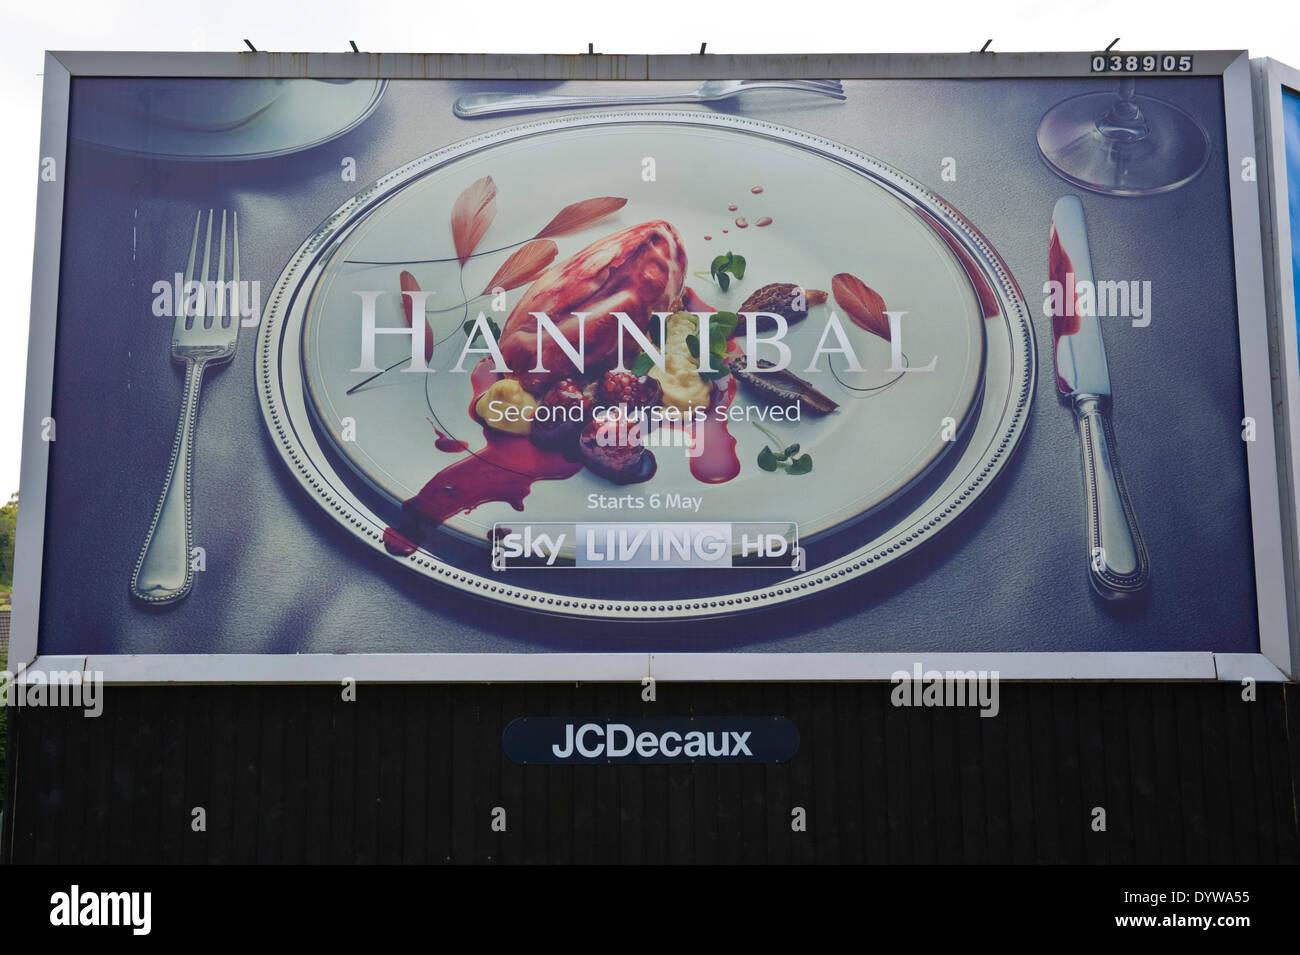 Sky Living HD Hannibal advertising billboard on JCDecaux roadside site in Newport South Wales UK - Stock Image